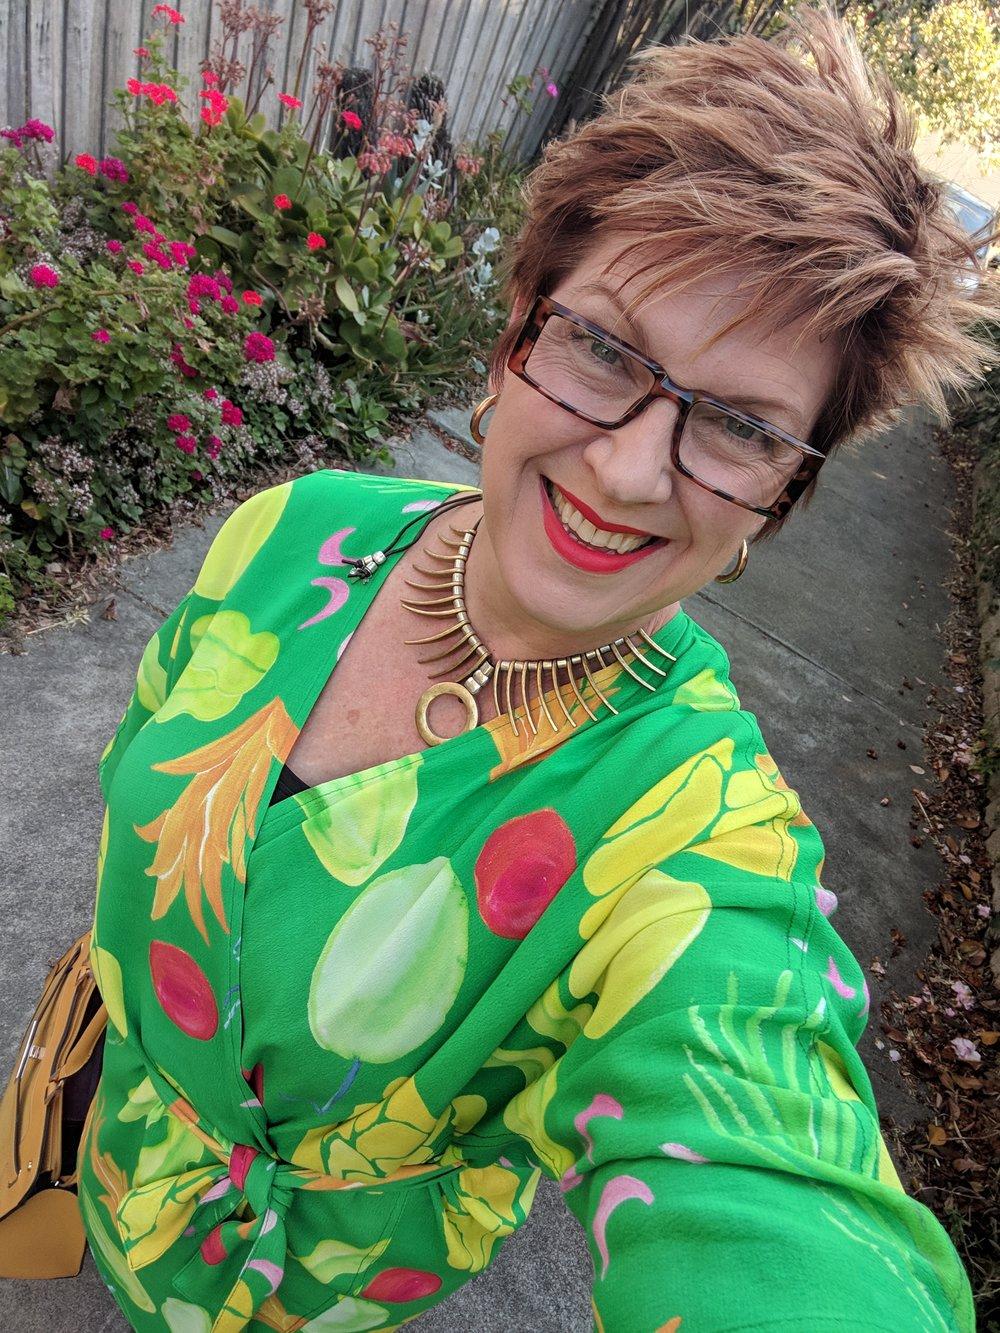 Wearing a Tara Whalley Design